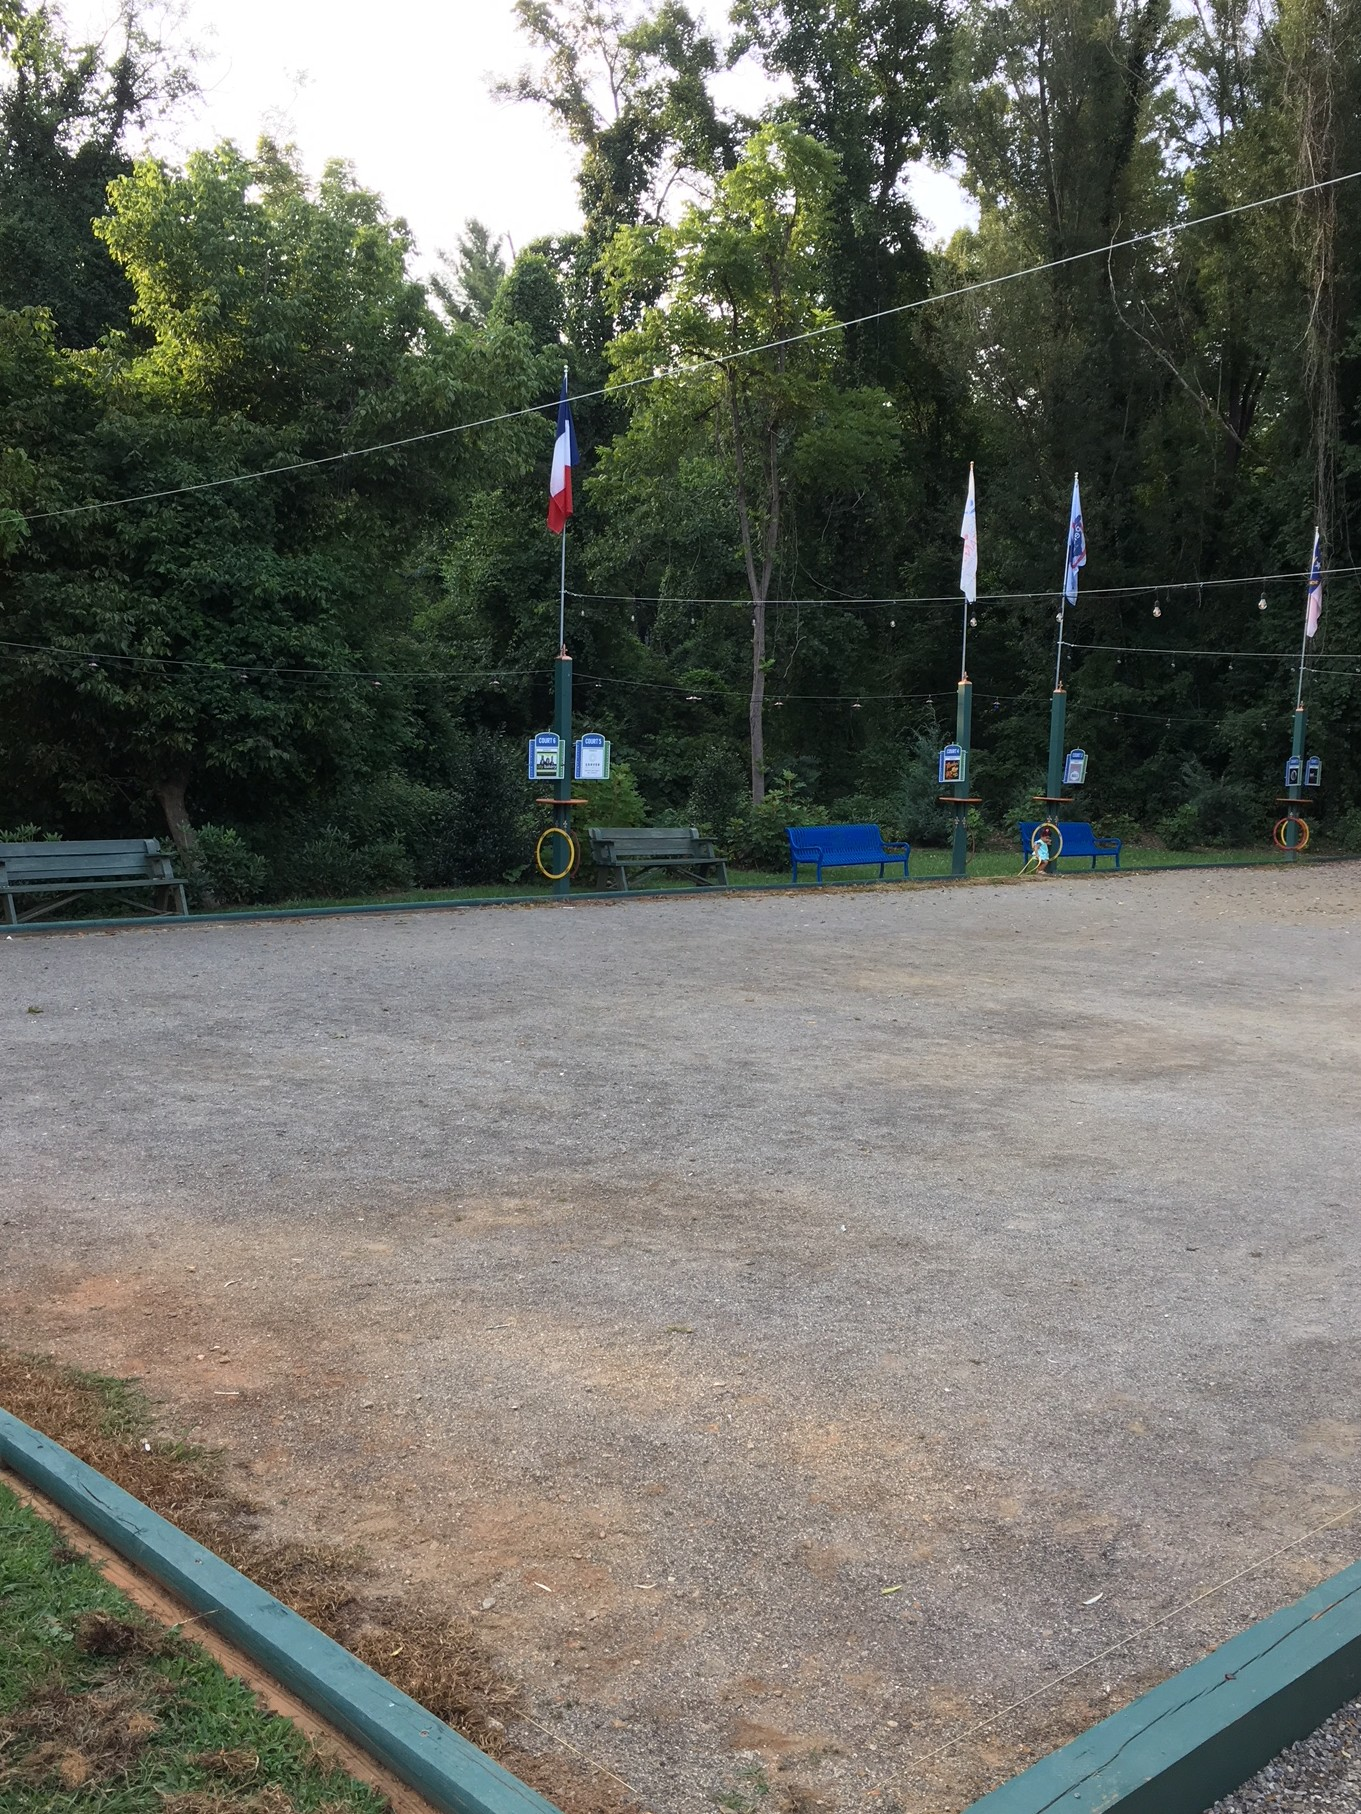 Petanque courts at Rendezvous